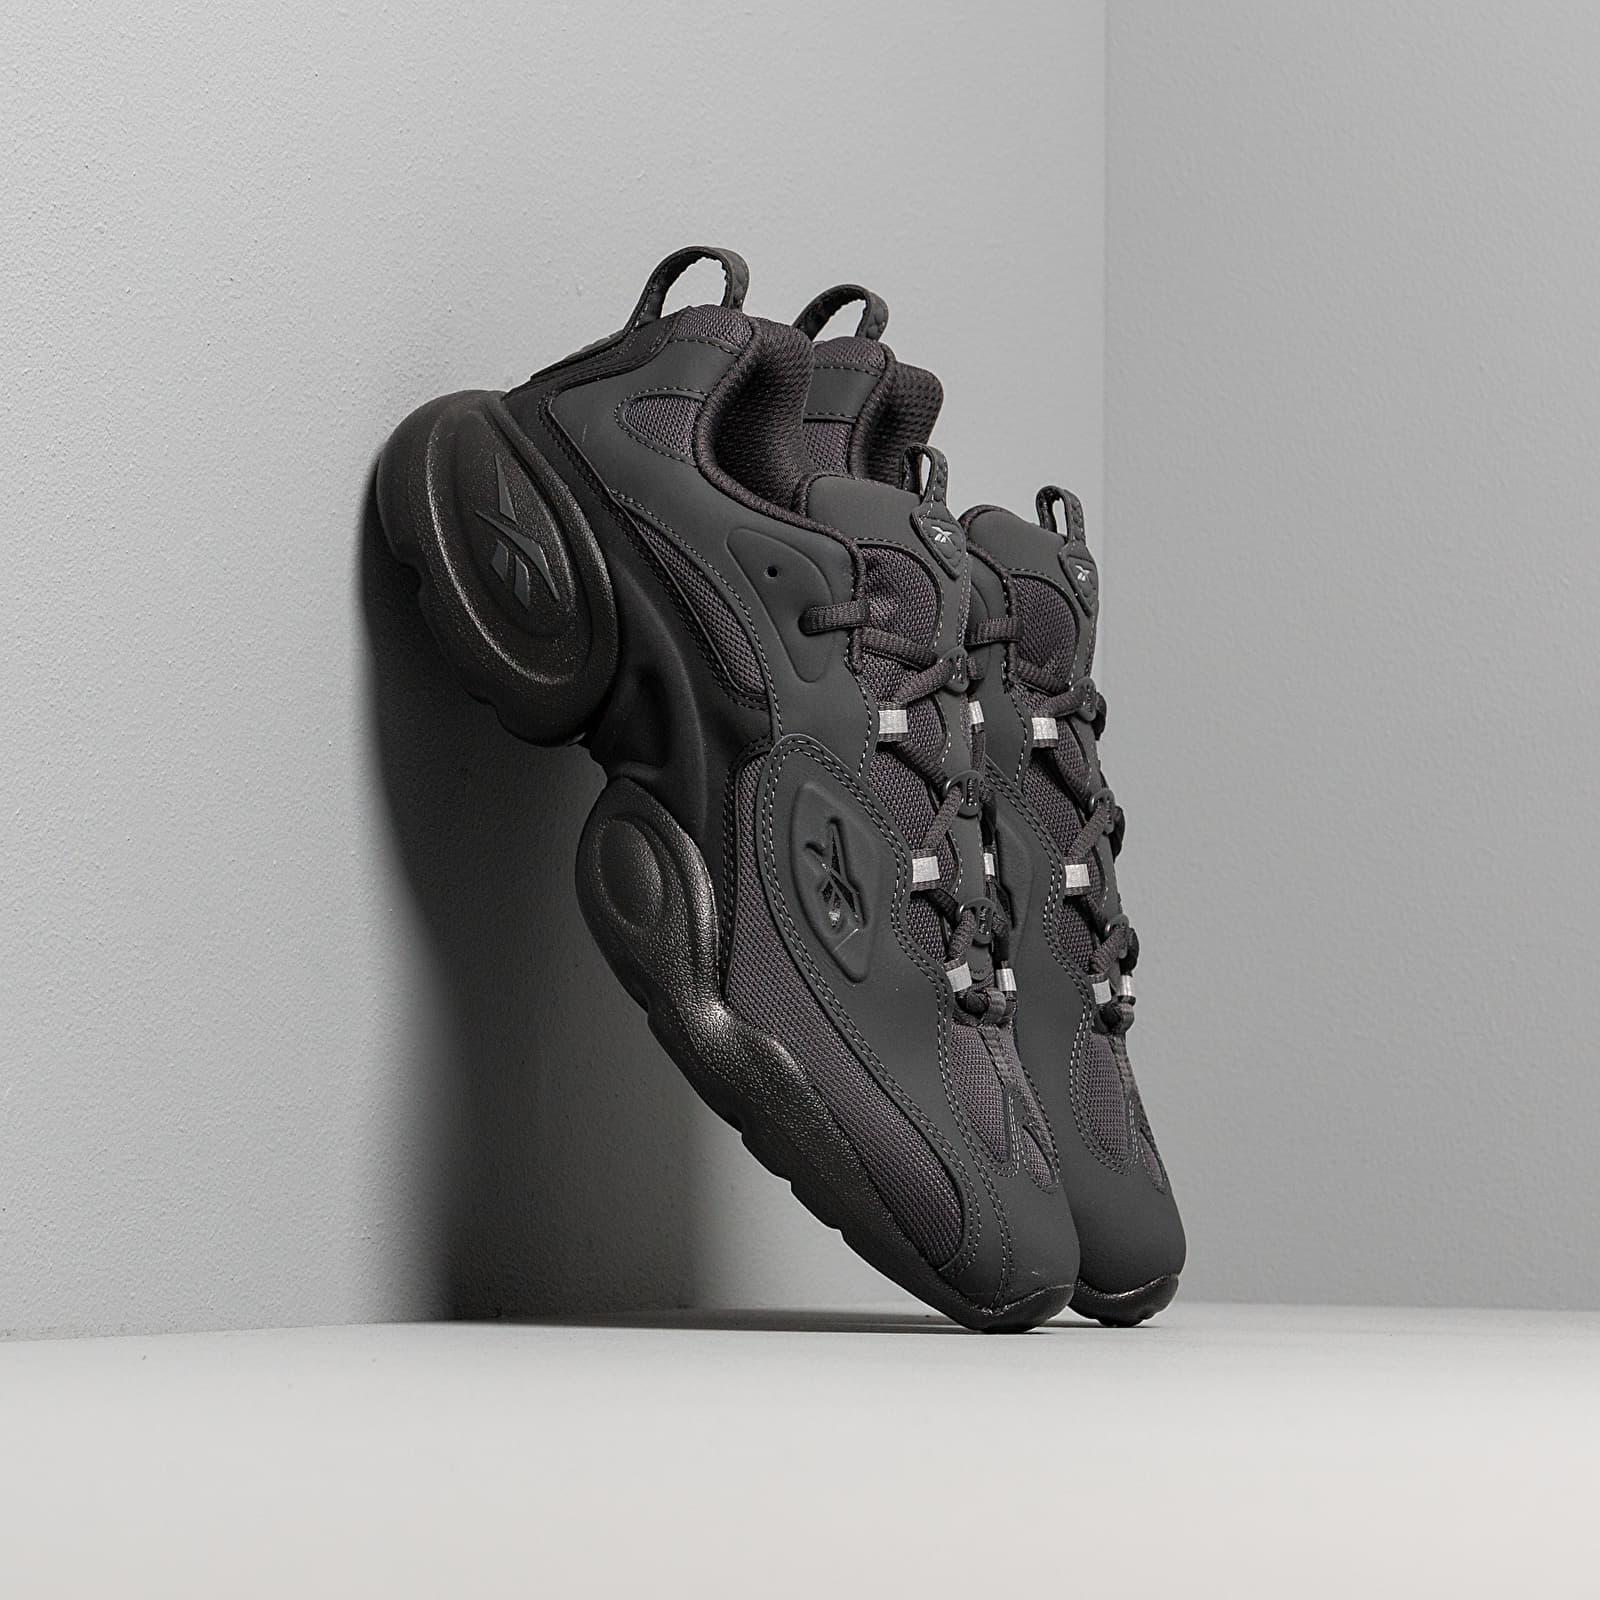 Men's shoes Reebok Electro 3D 97 Black/ True Grey